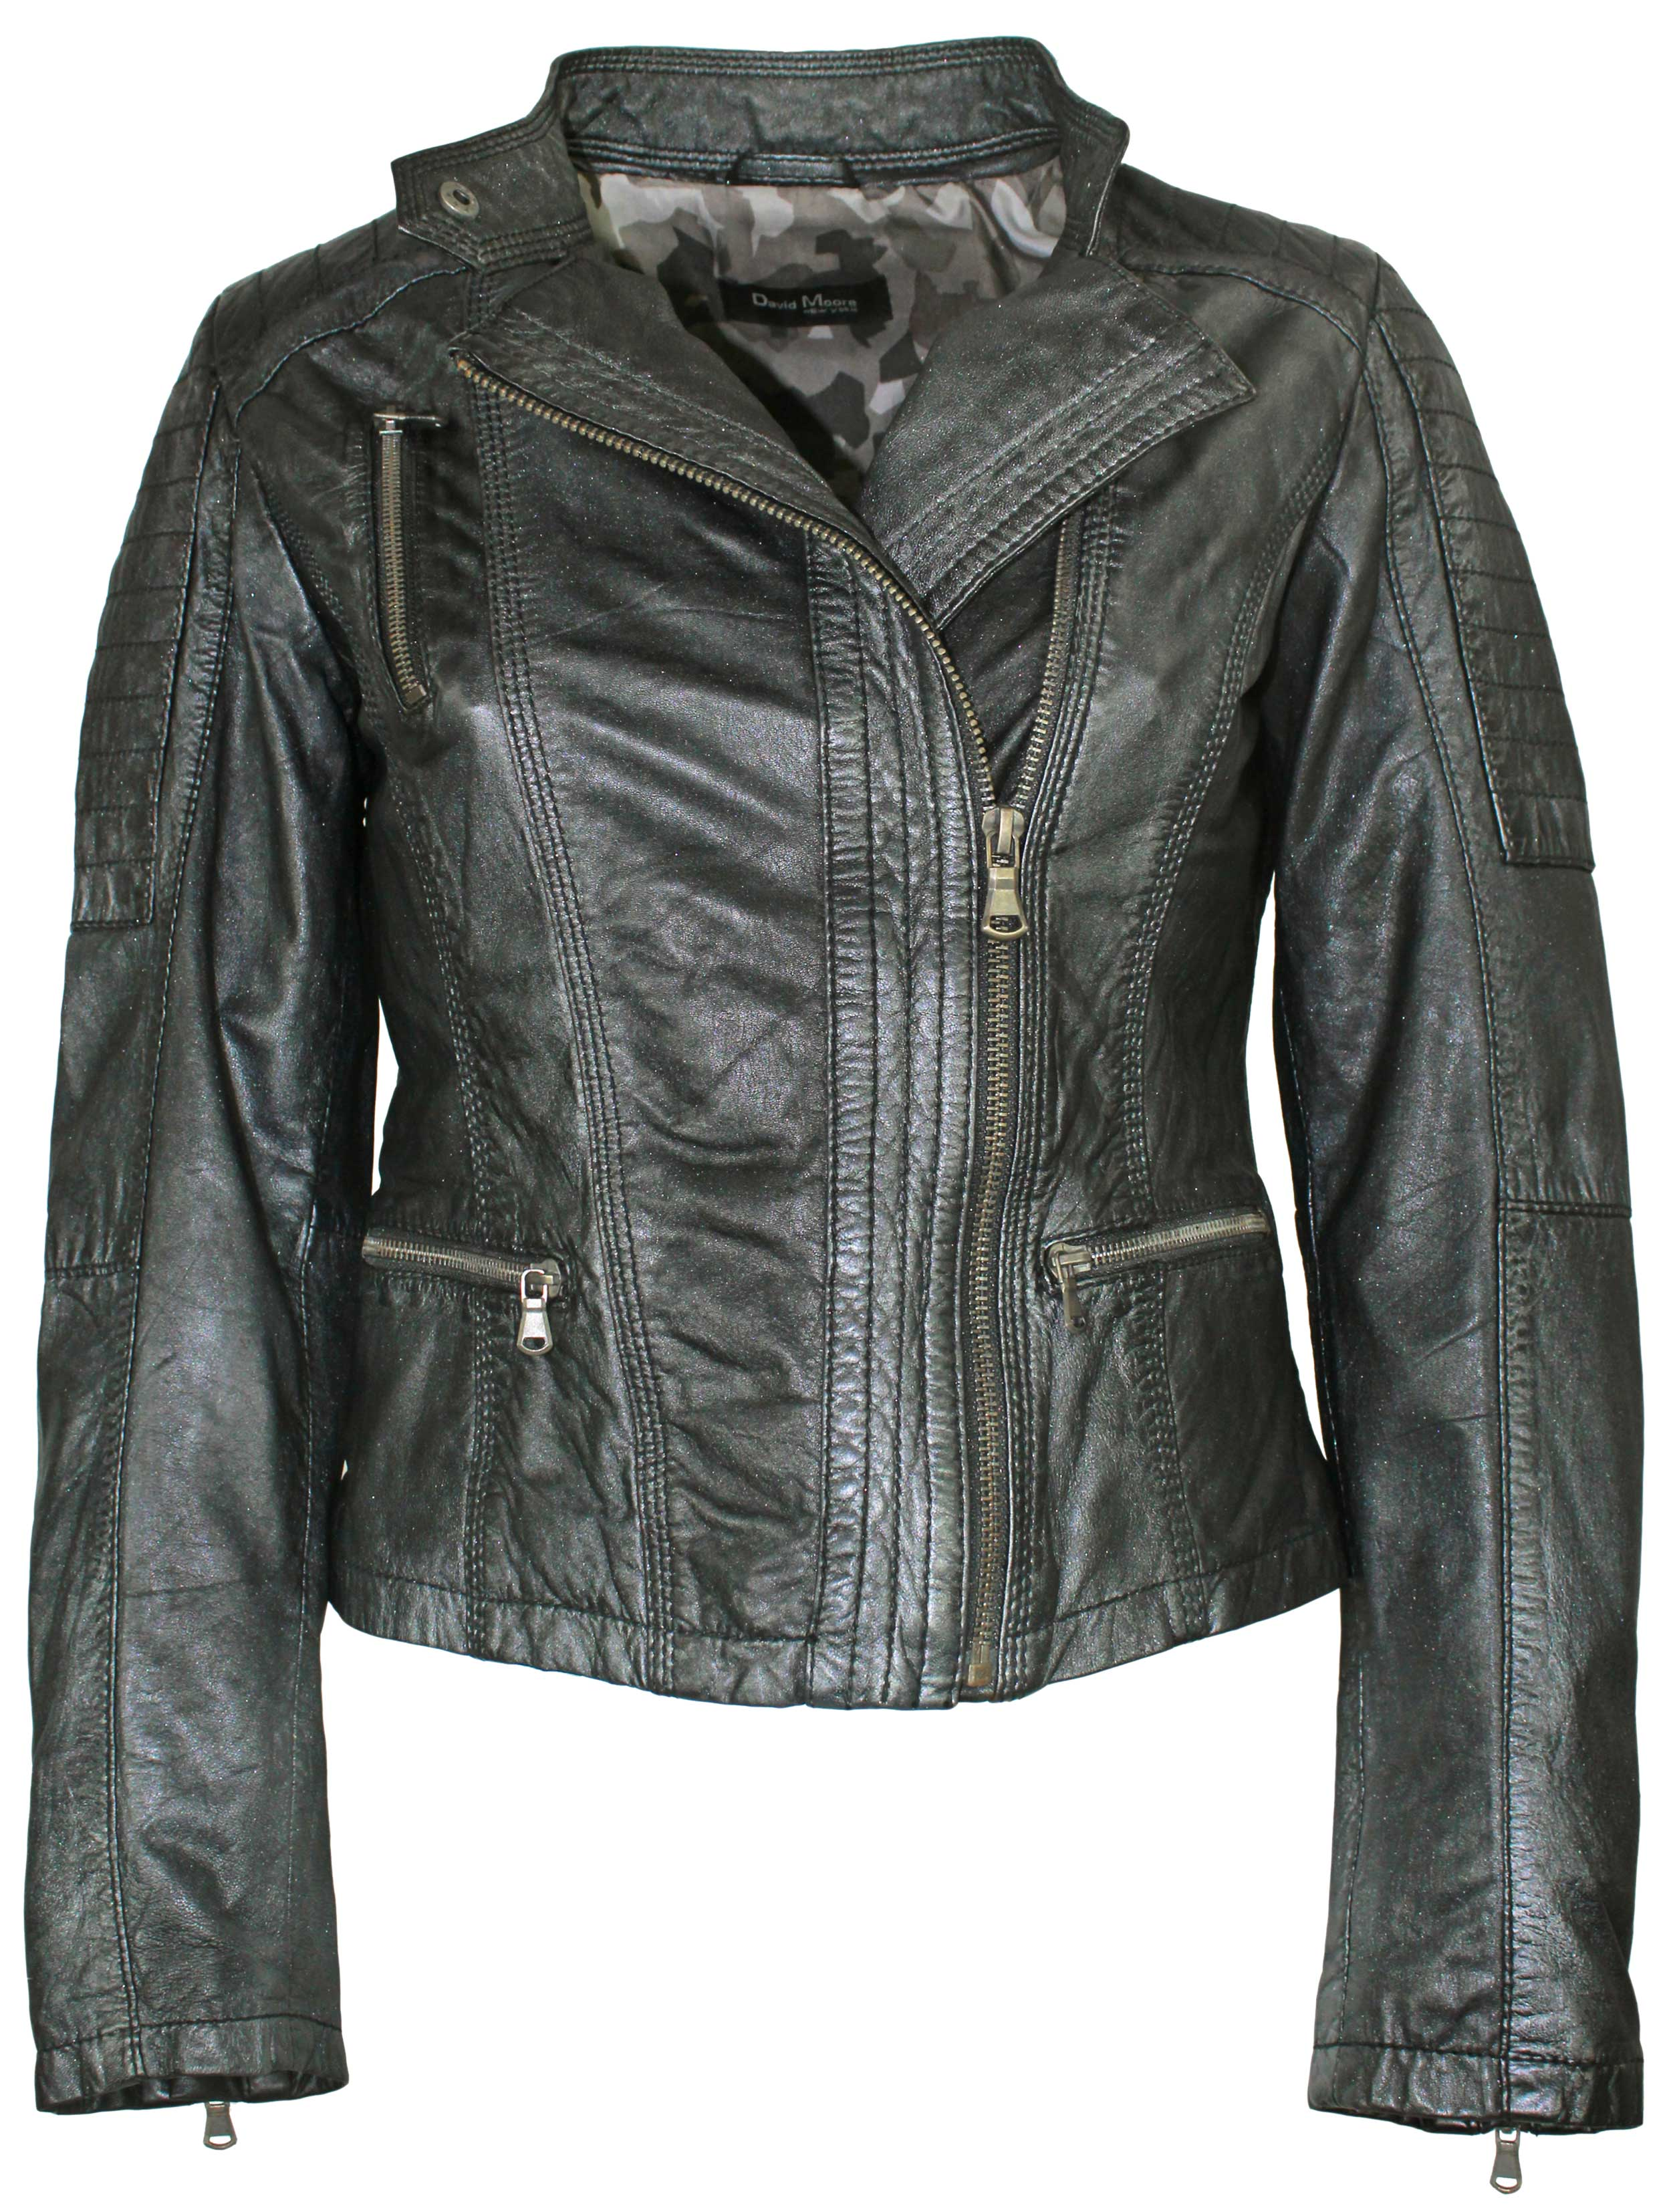 David Moore Damen Lederjacke Lammnappa schwarz silber | 99,95 EUR